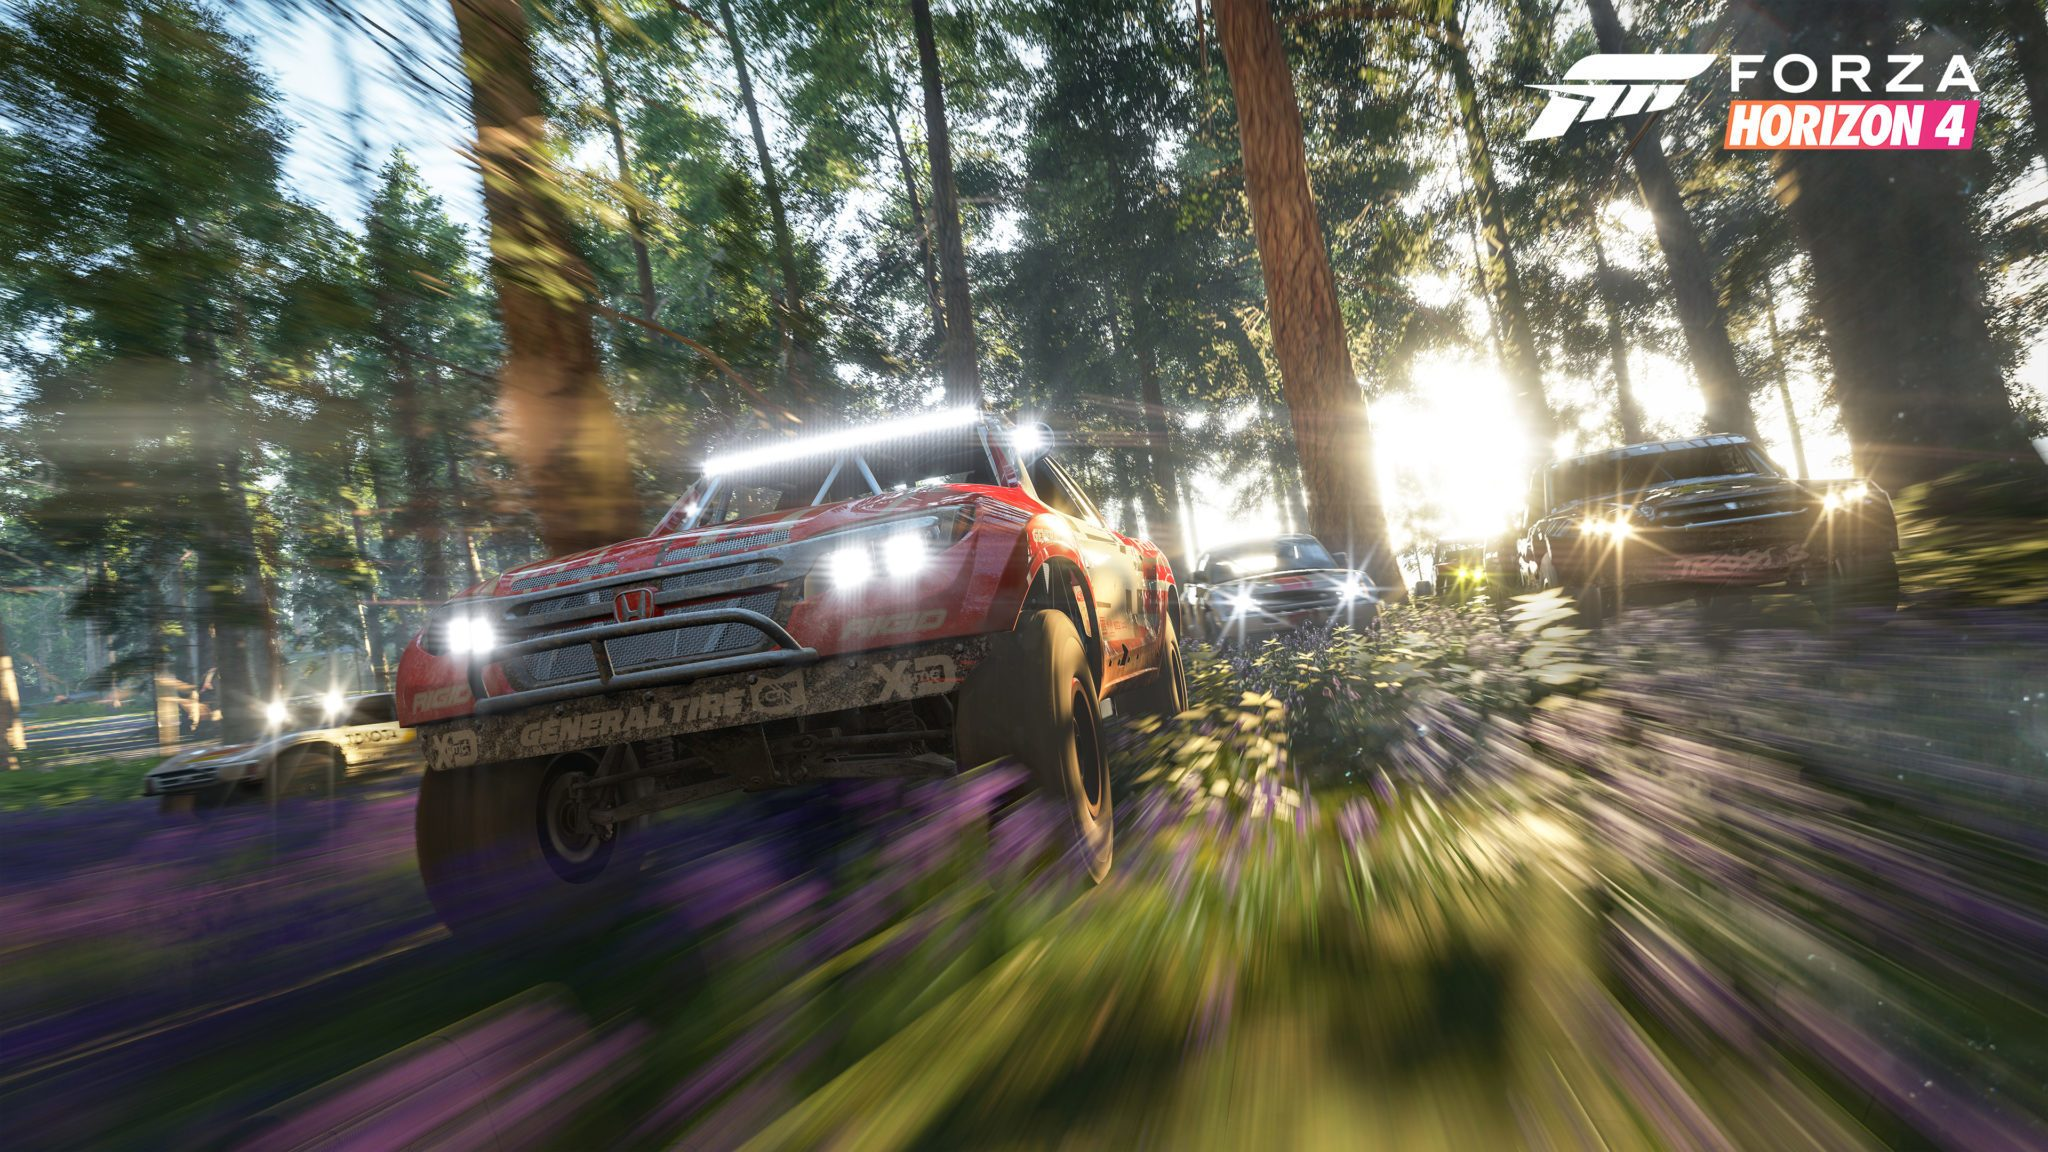 Forza-Horizon-4_Forest-Trucks.jpg